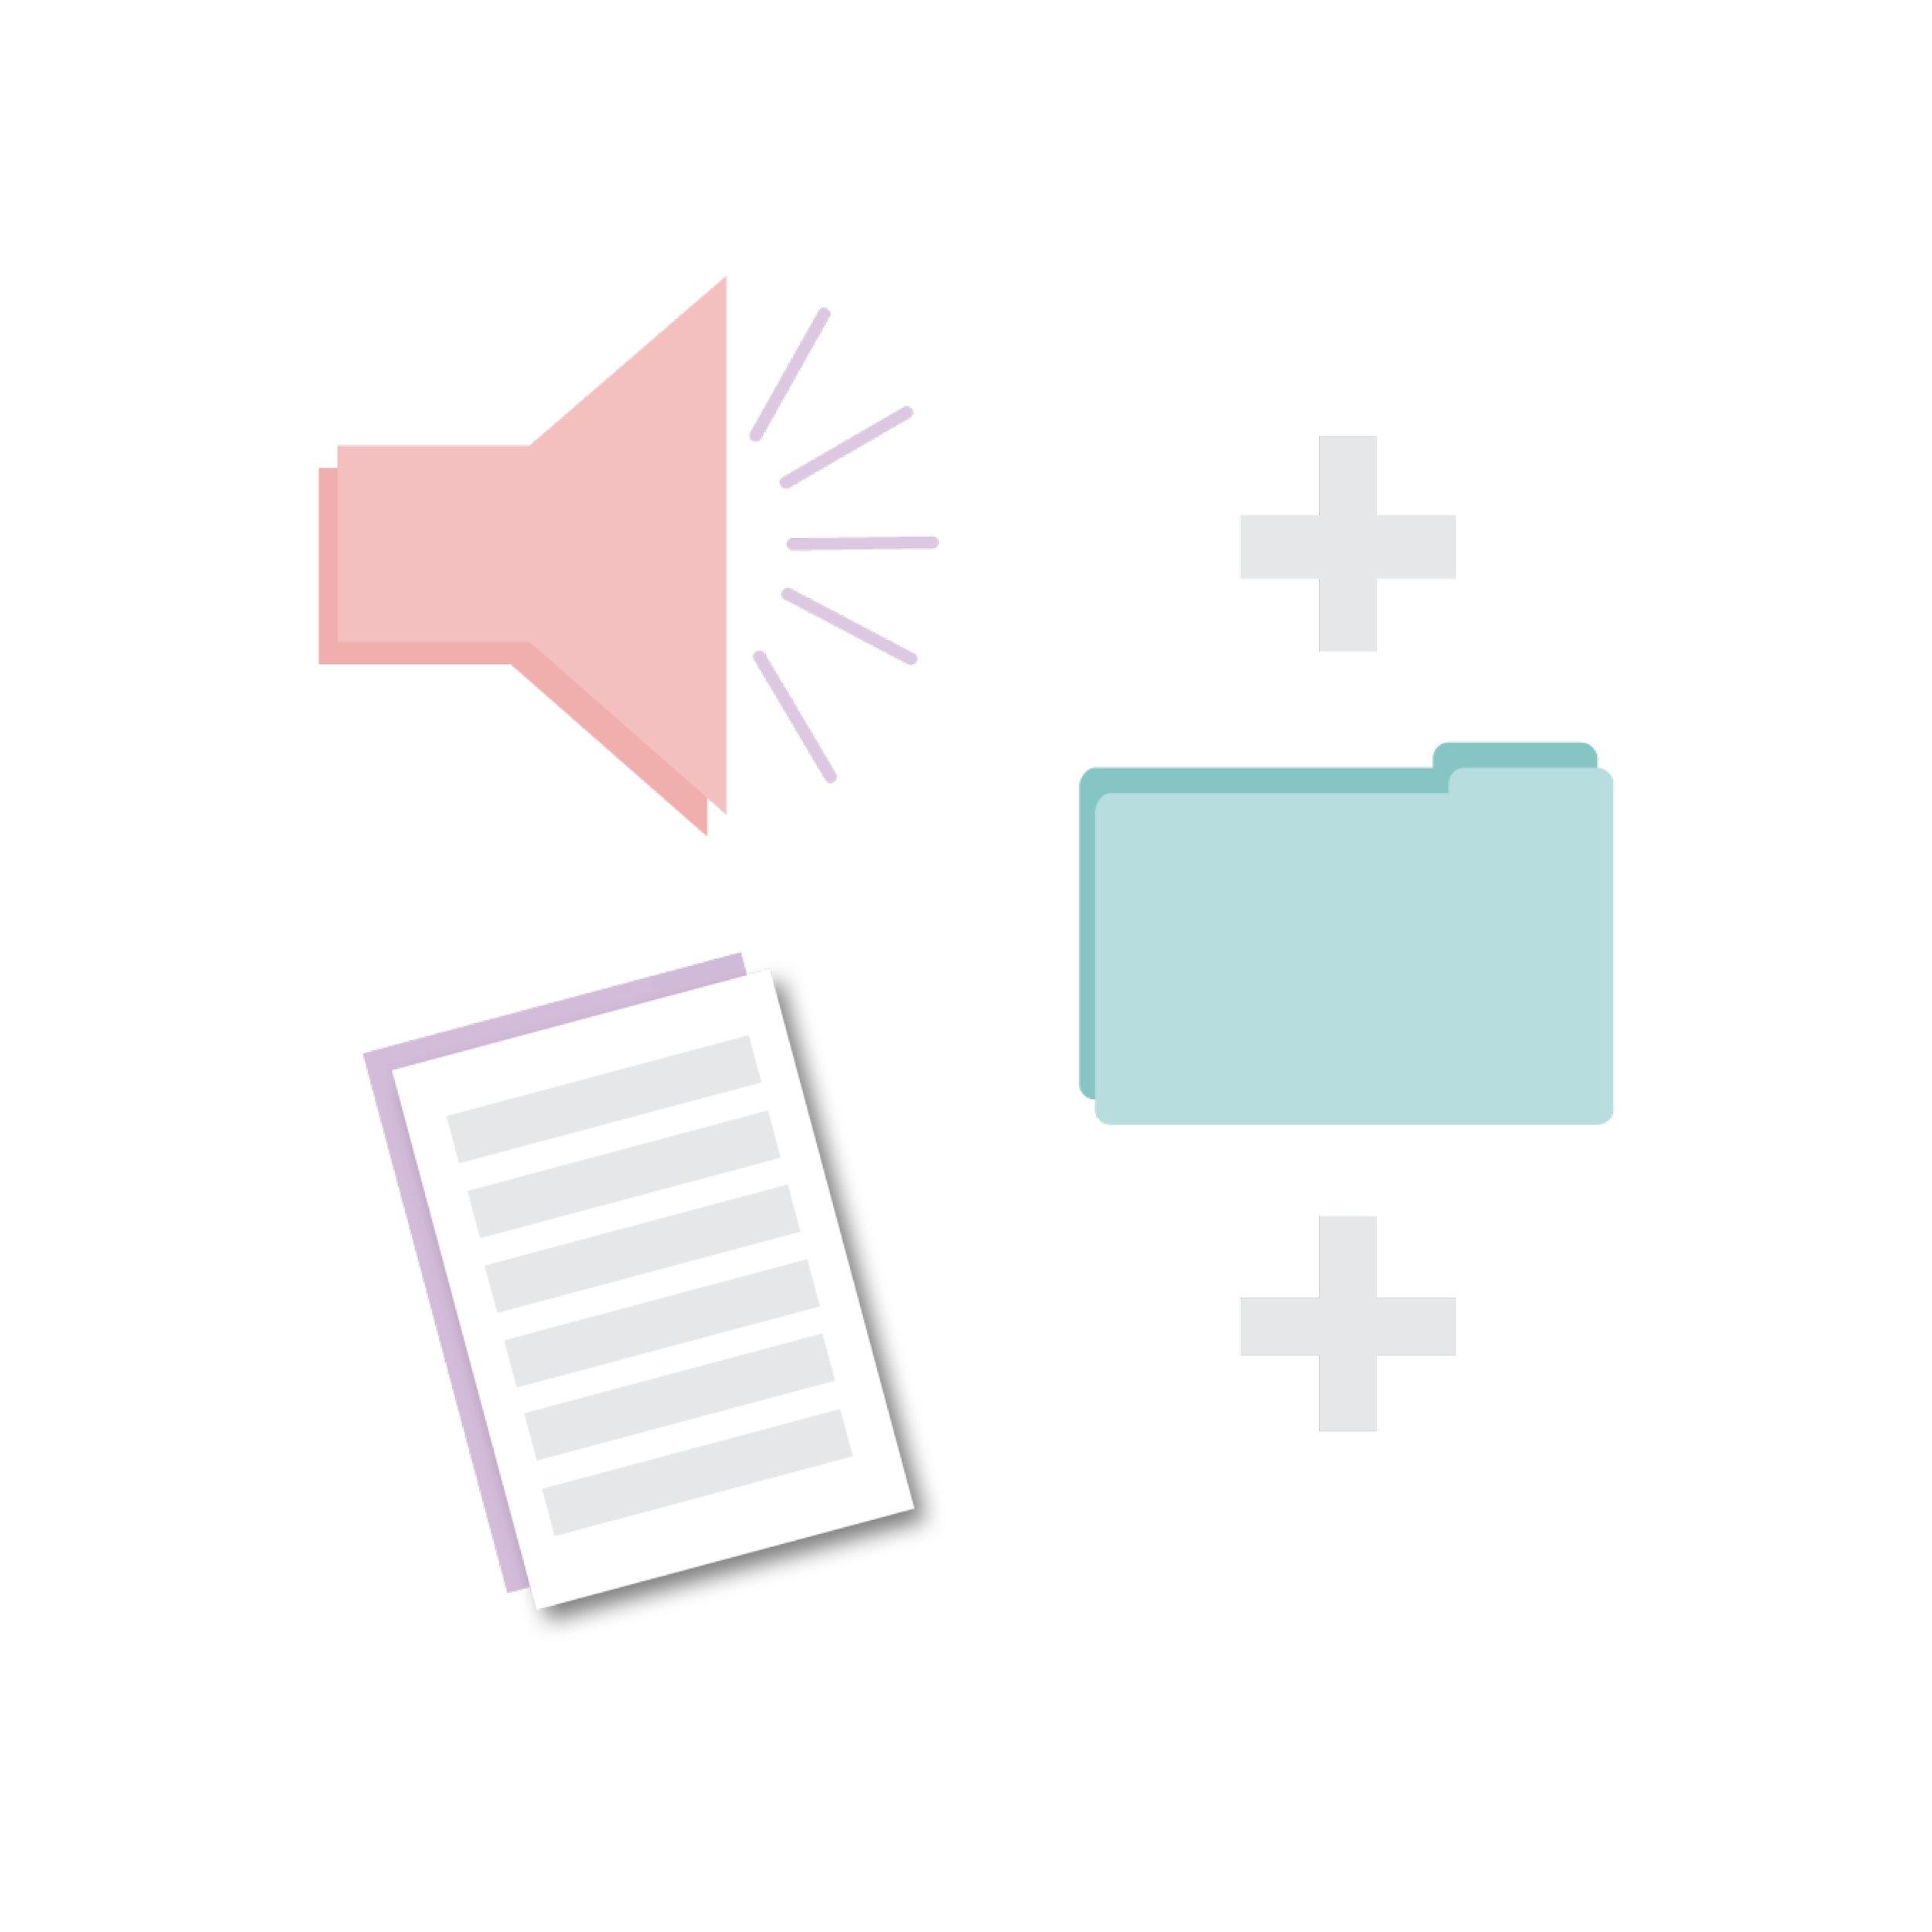 icon-resources.jpg